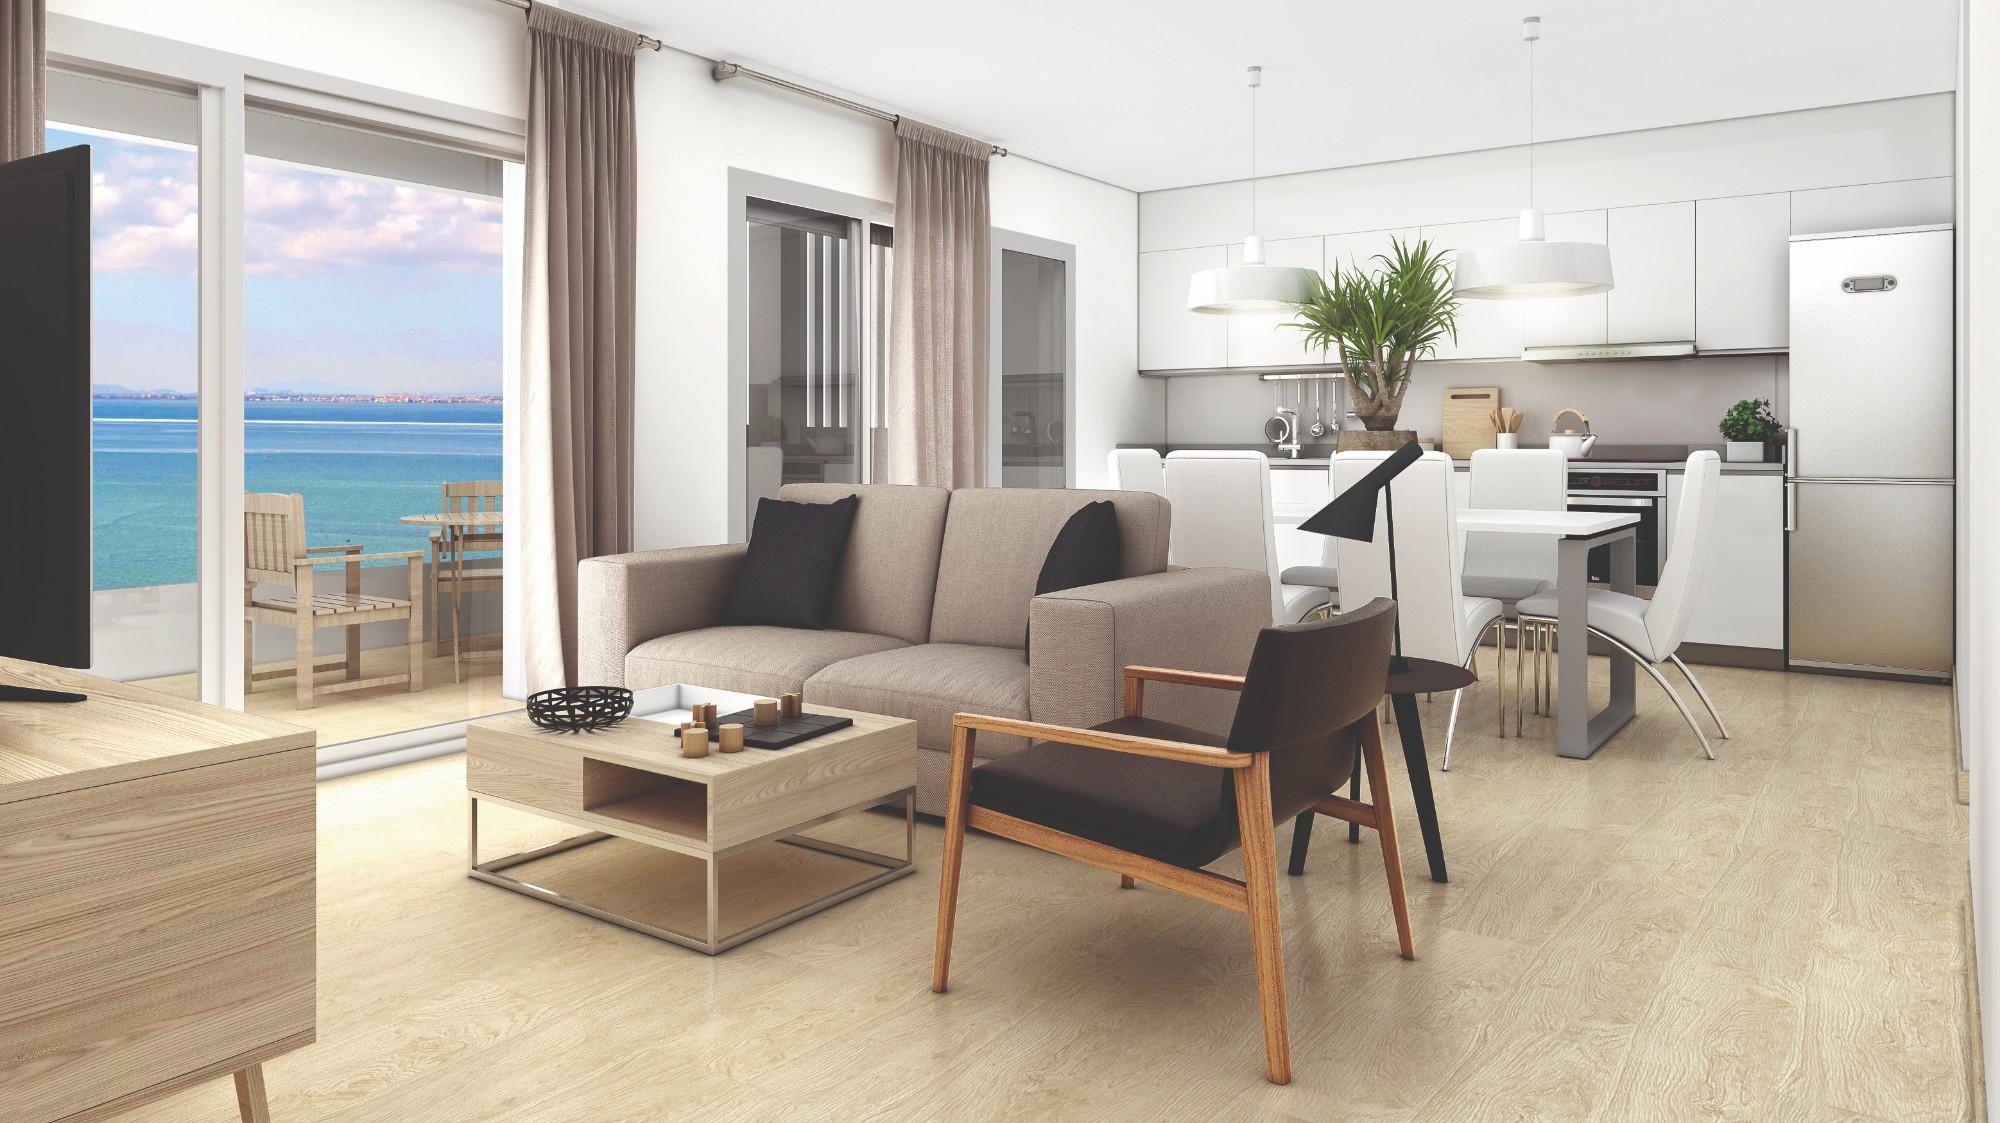 For sale: 2 bedroom apartment / flat in La Manga del Mar Menor